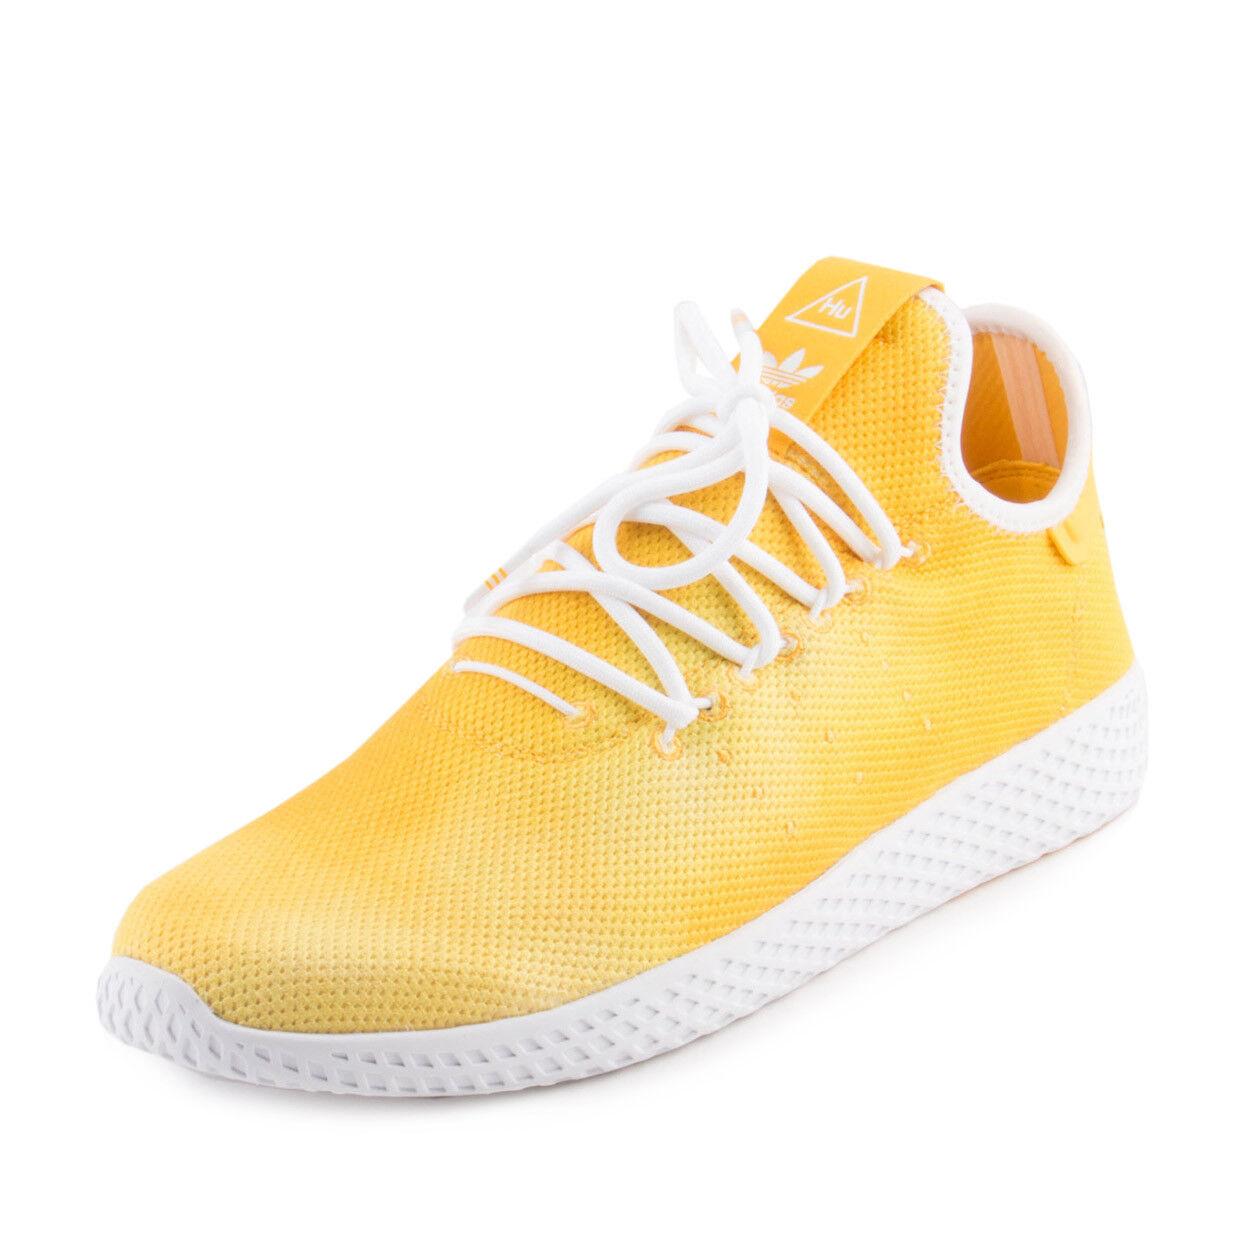 Adidas  Mens PW HU HOLI Tennis HU Pharrell Williams Yellow/White DA9617 best-selling model of the brand